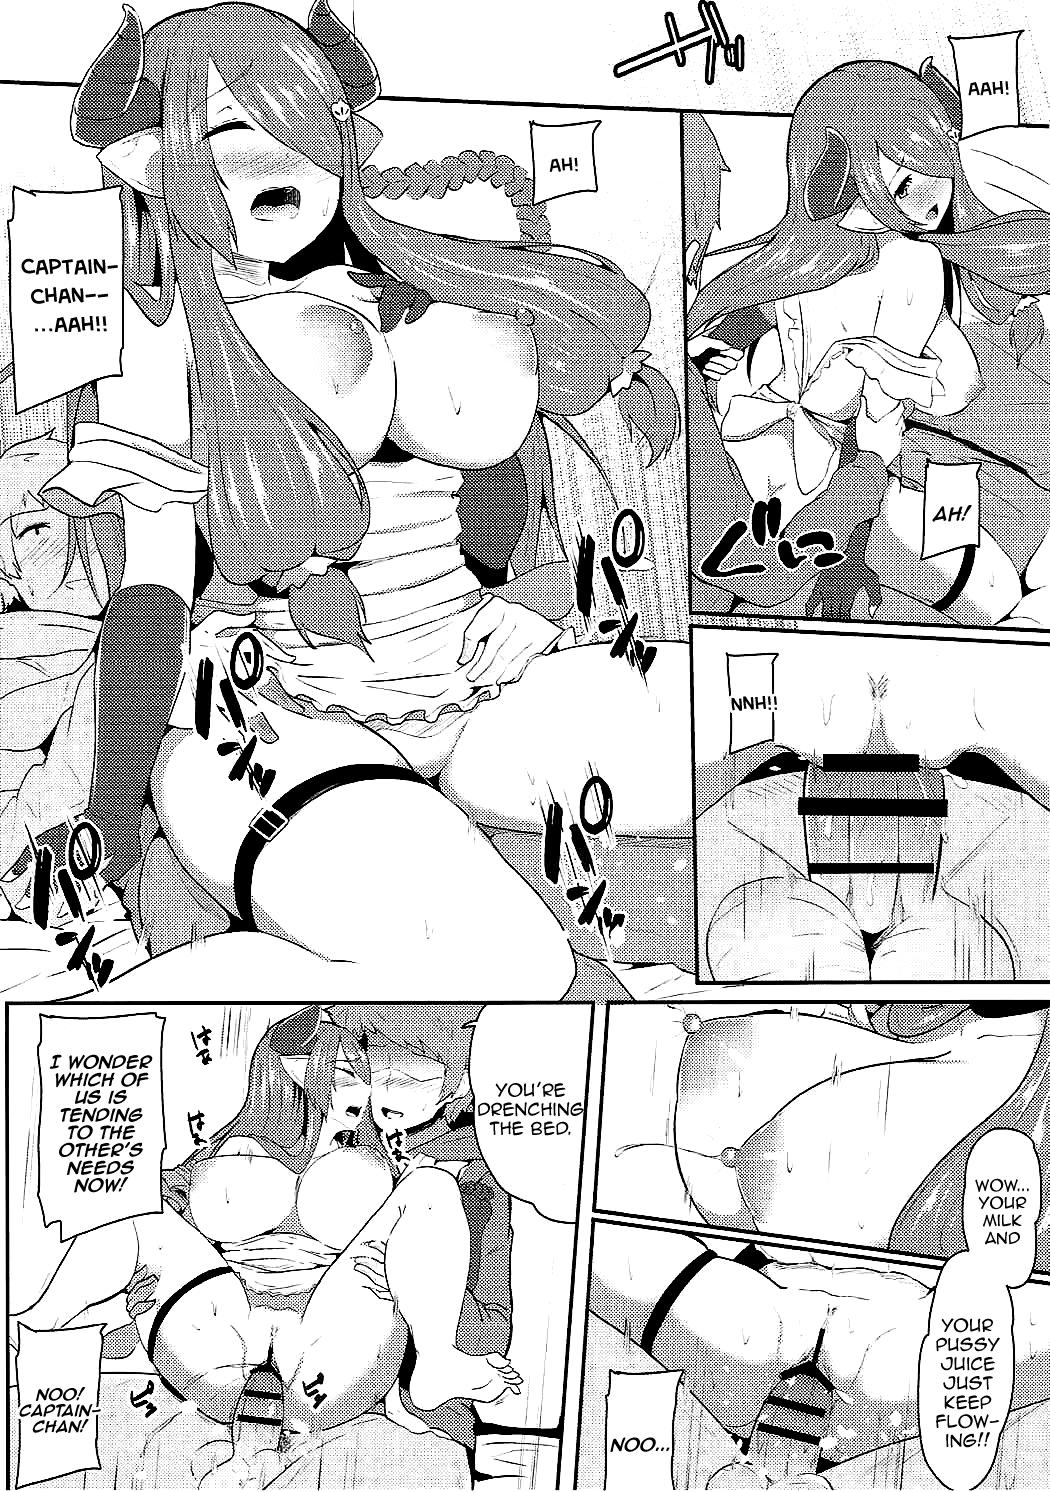 (C91) [Monokuromomiji (Yuna)] Danchou to Inbi na Zanki no Onee-san | A Draph-Loving Captain and the Obscene Blade Onee-san (Granblue Fantasy) [English] [Aoitenshi] 18